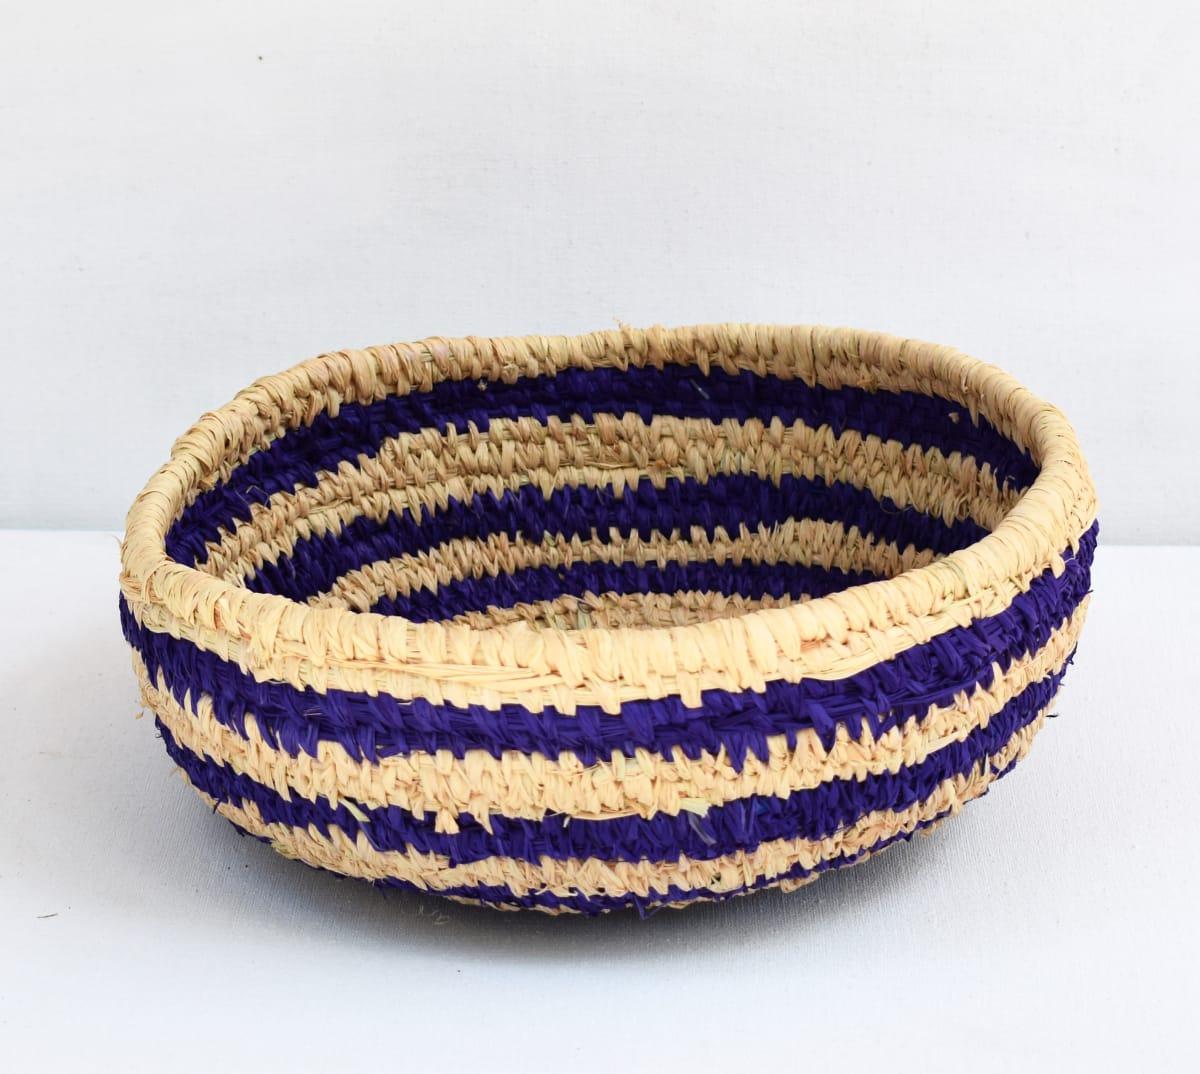 Julie Anderson Large round tall basket tjanpi, raffia and yarn 30 x 10 cm